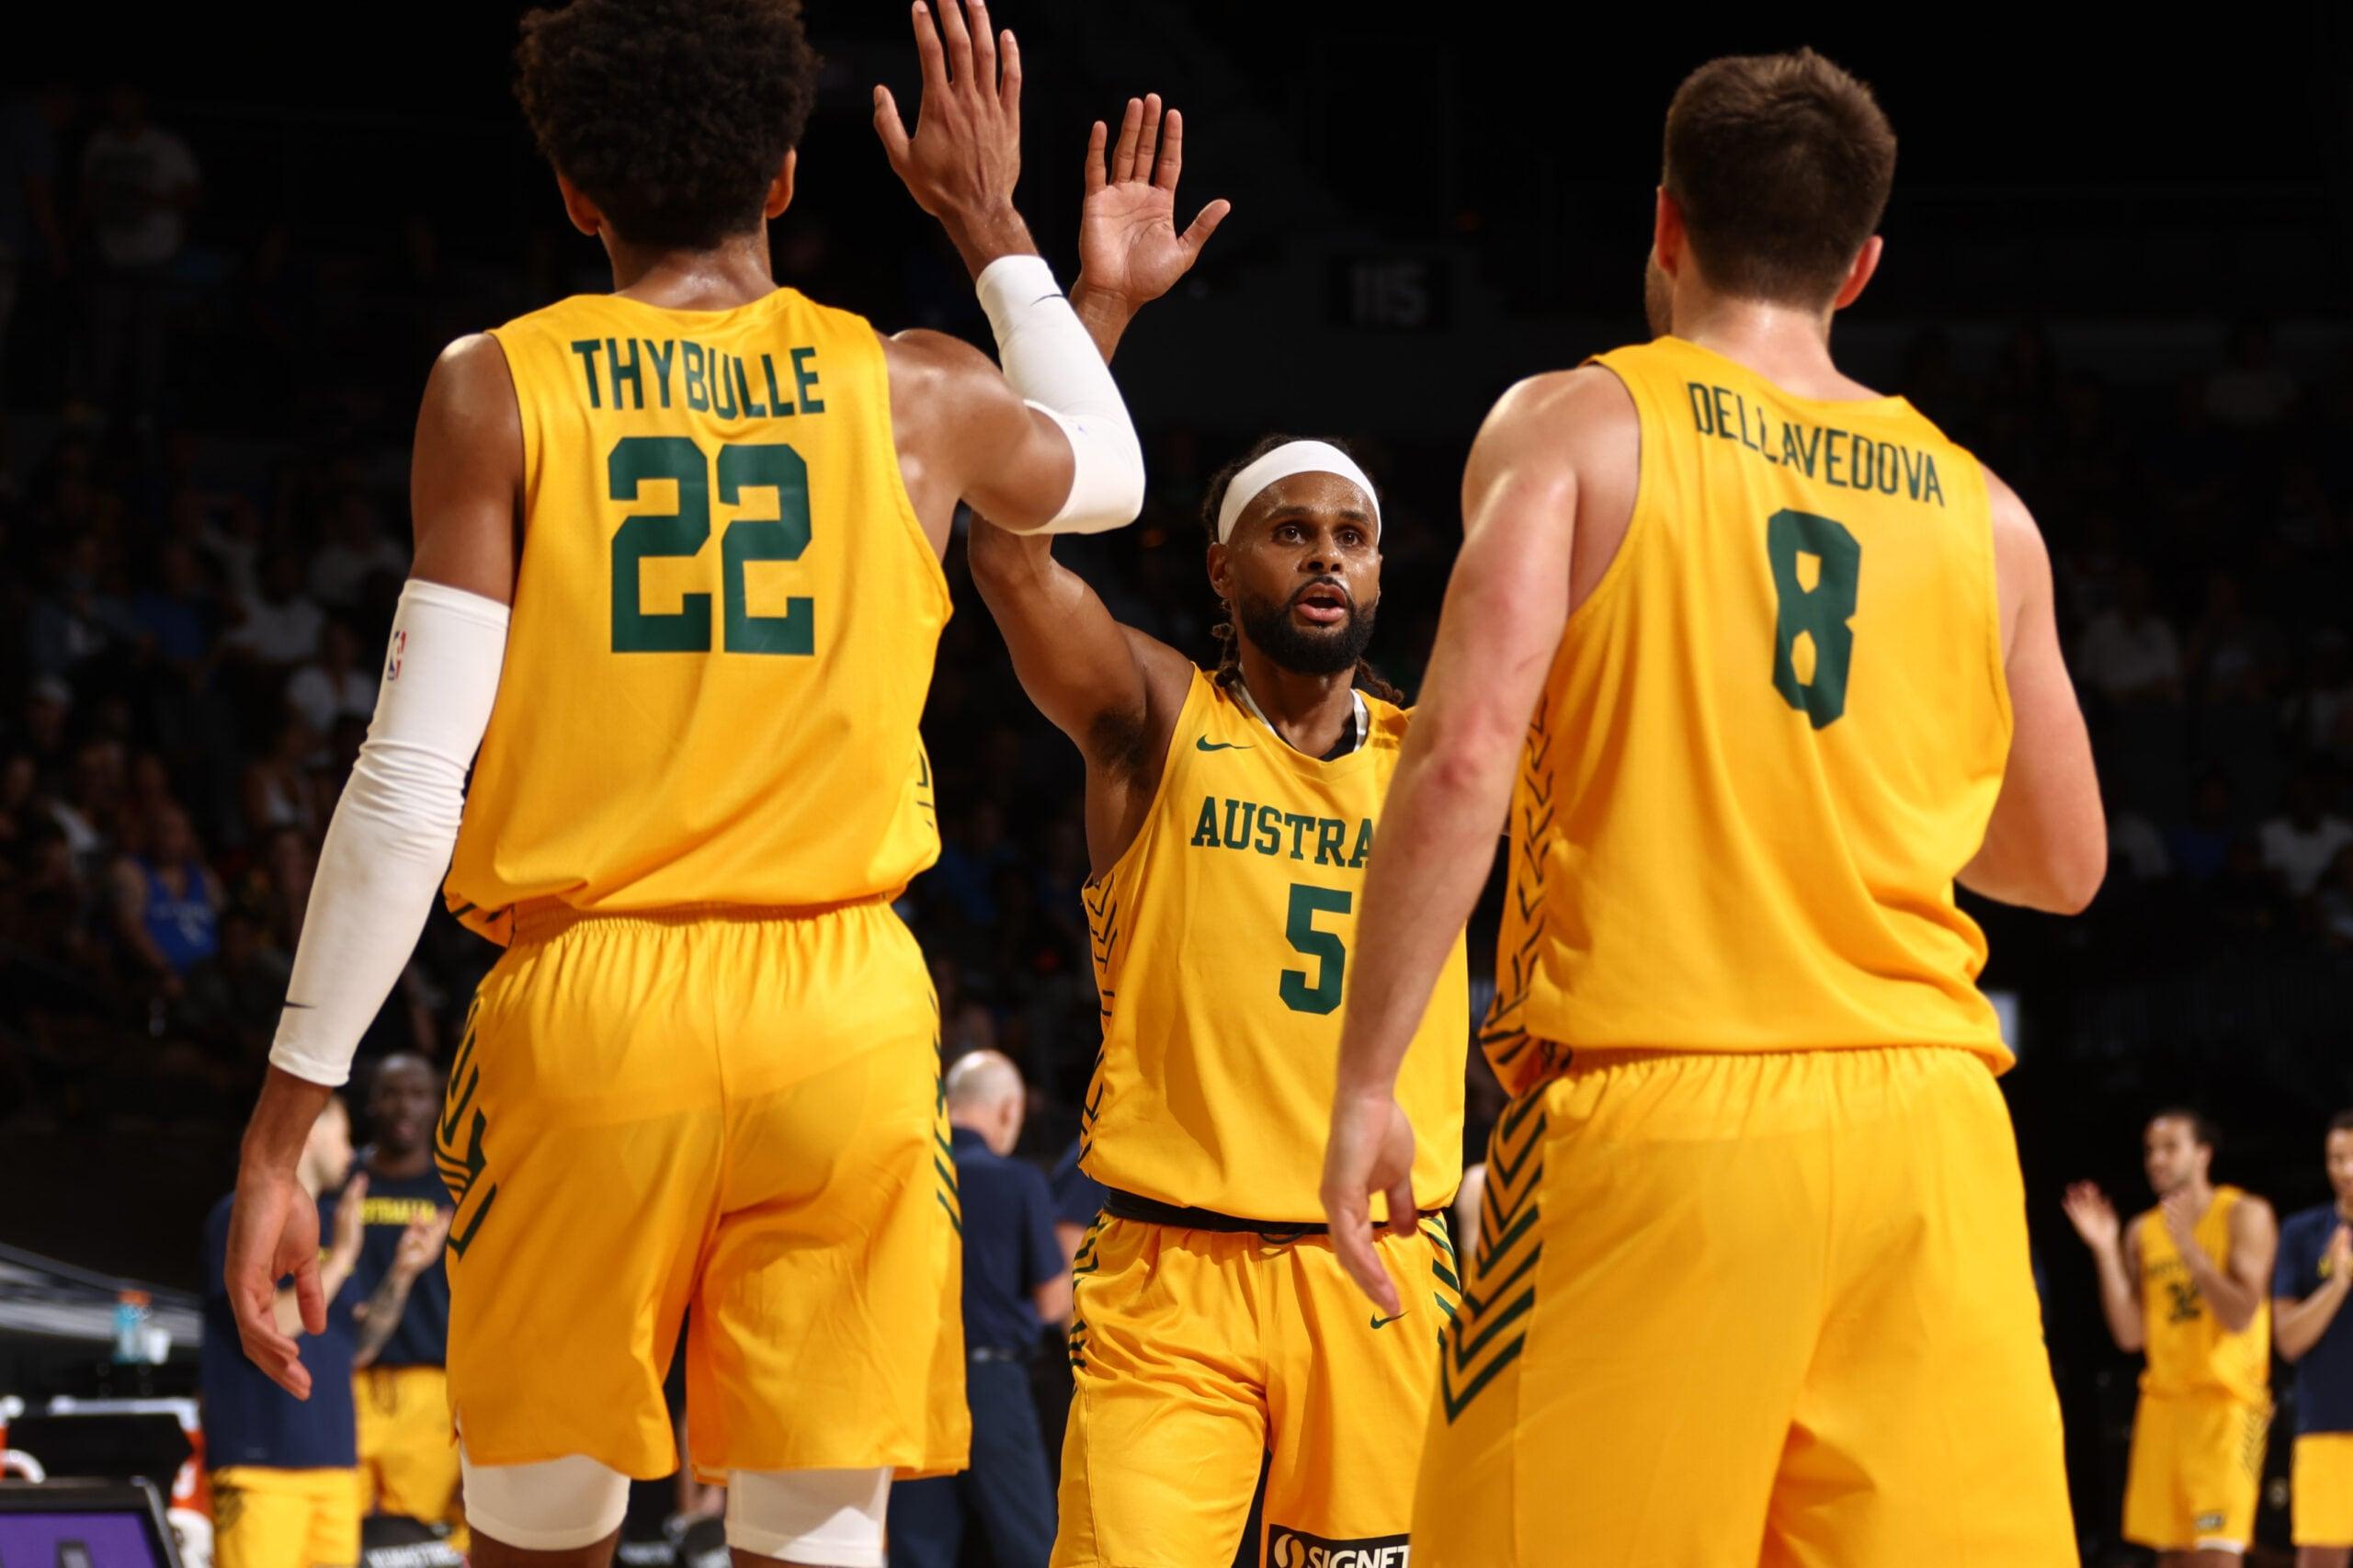 Australia tops Team USA in second exhibition game | NBA.com